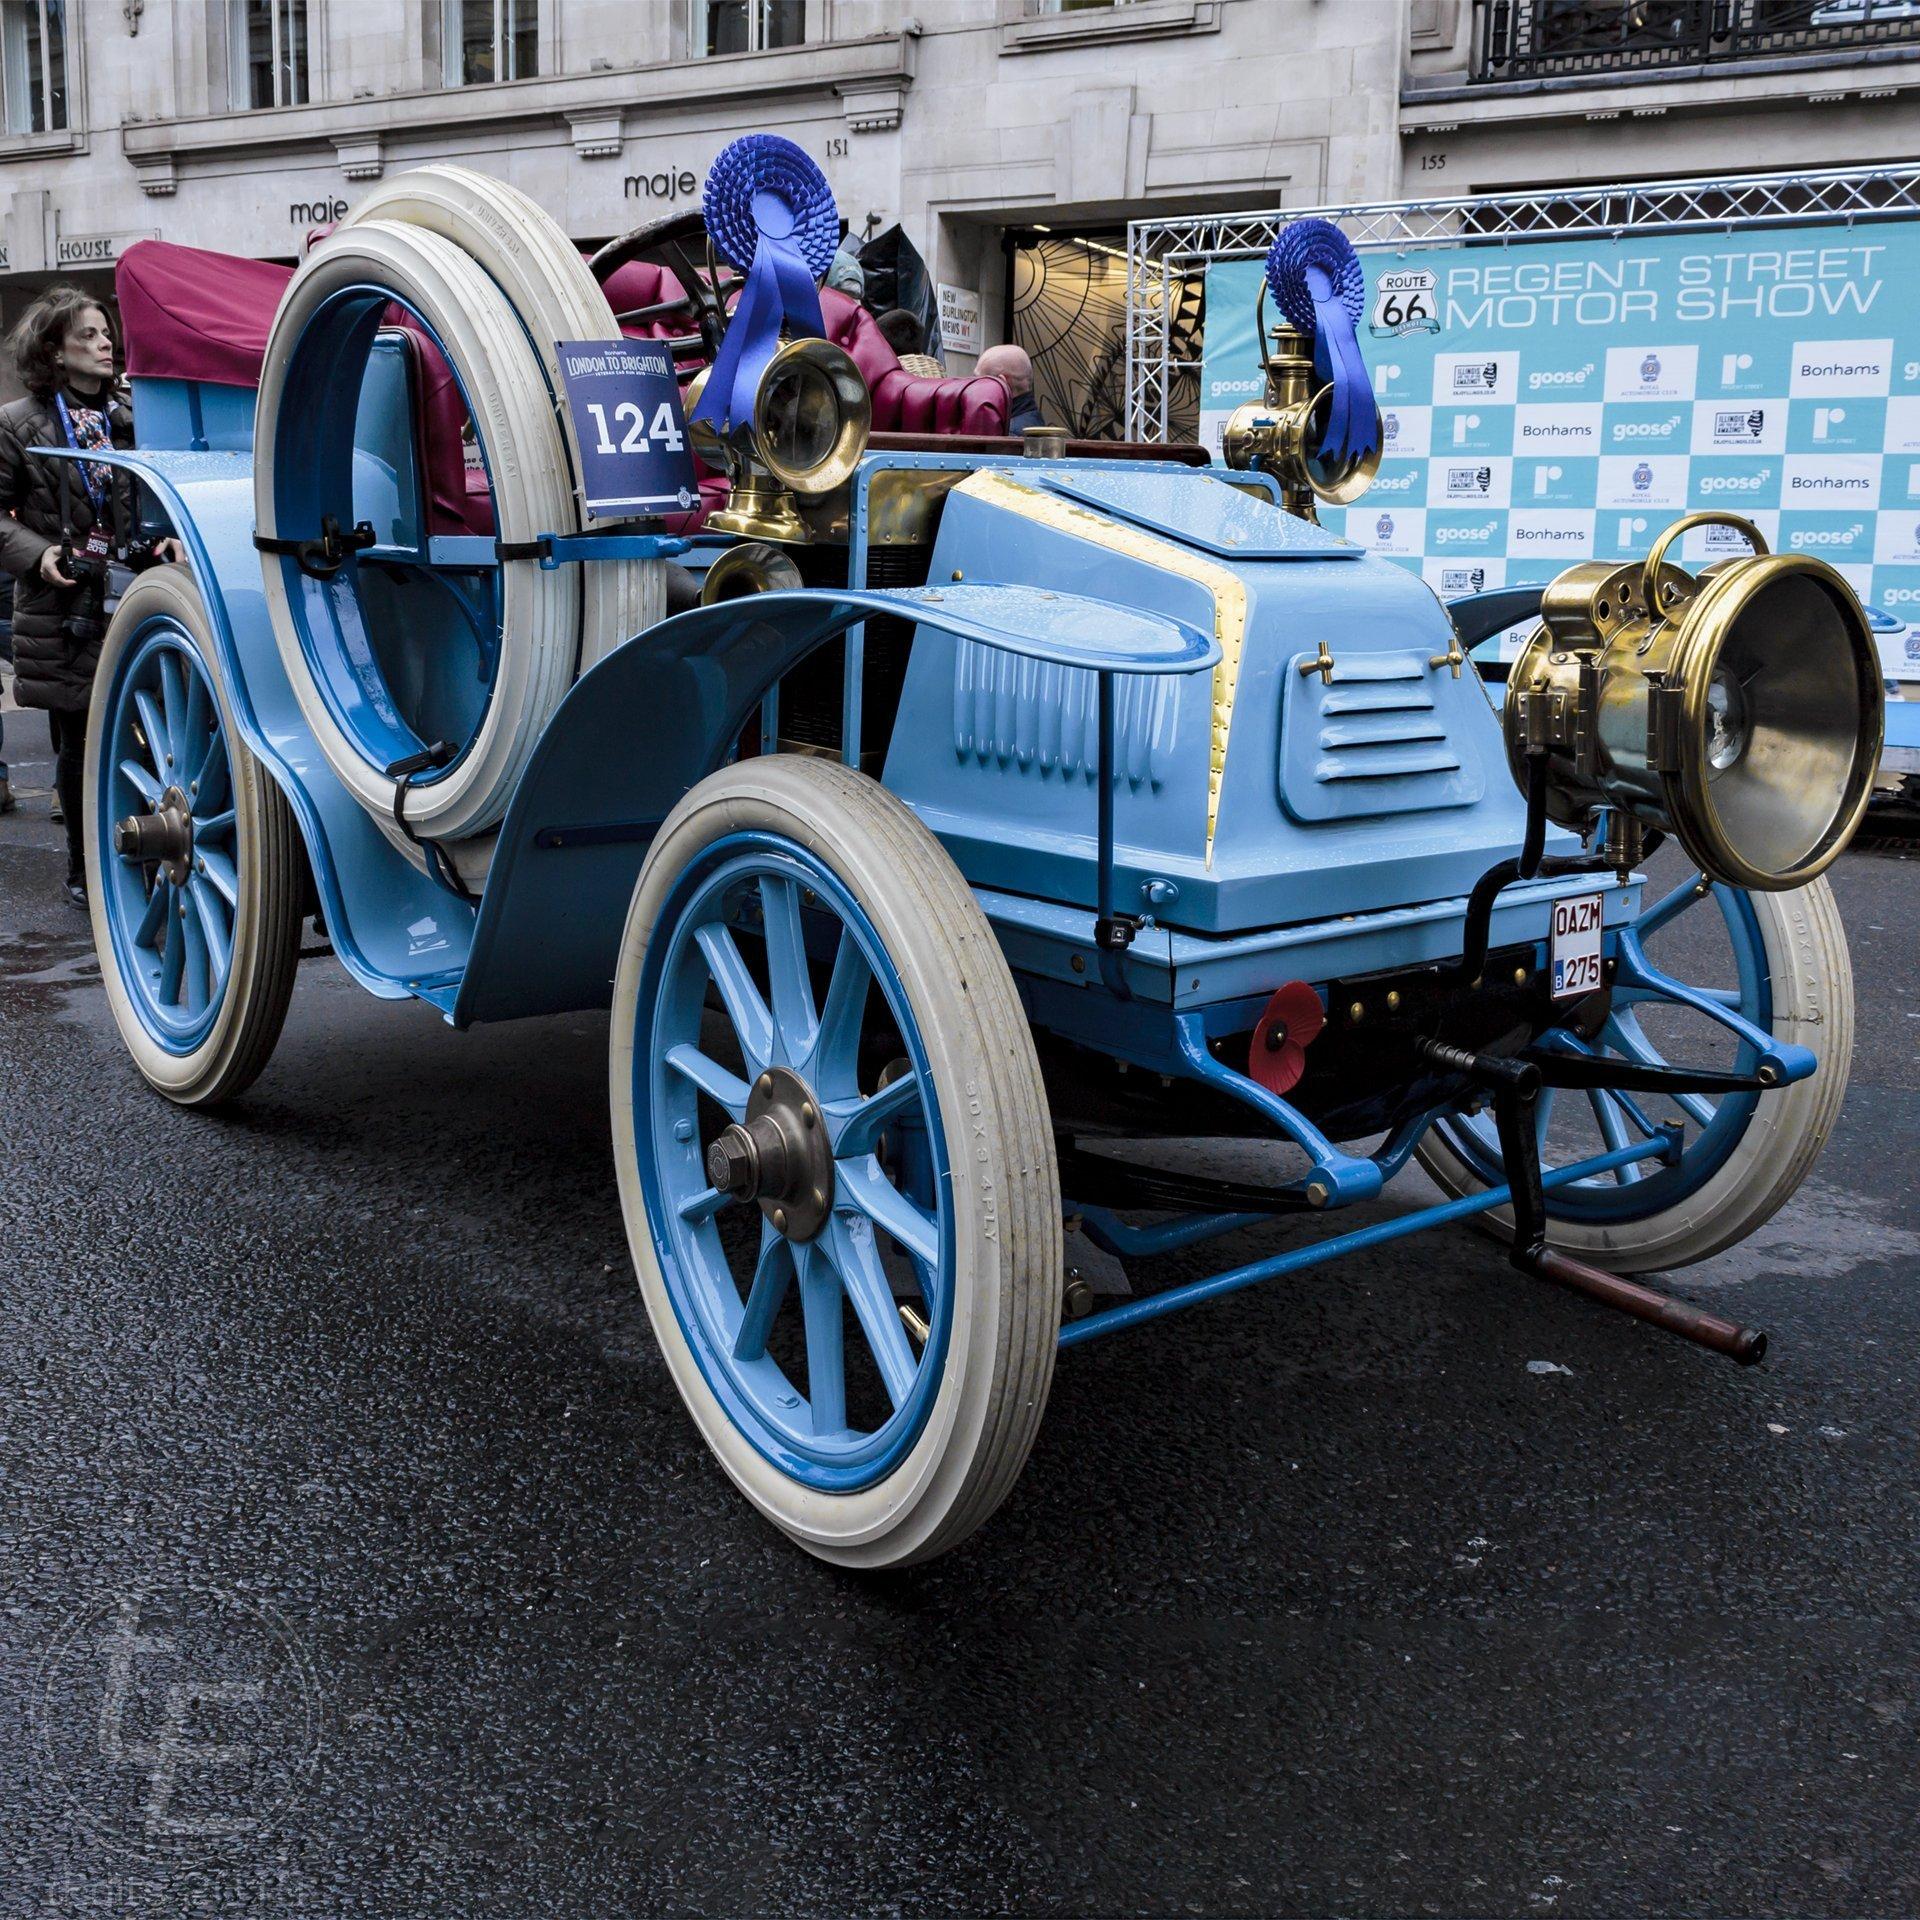 1902 Peugeot - Regent Street Motor Show 2019